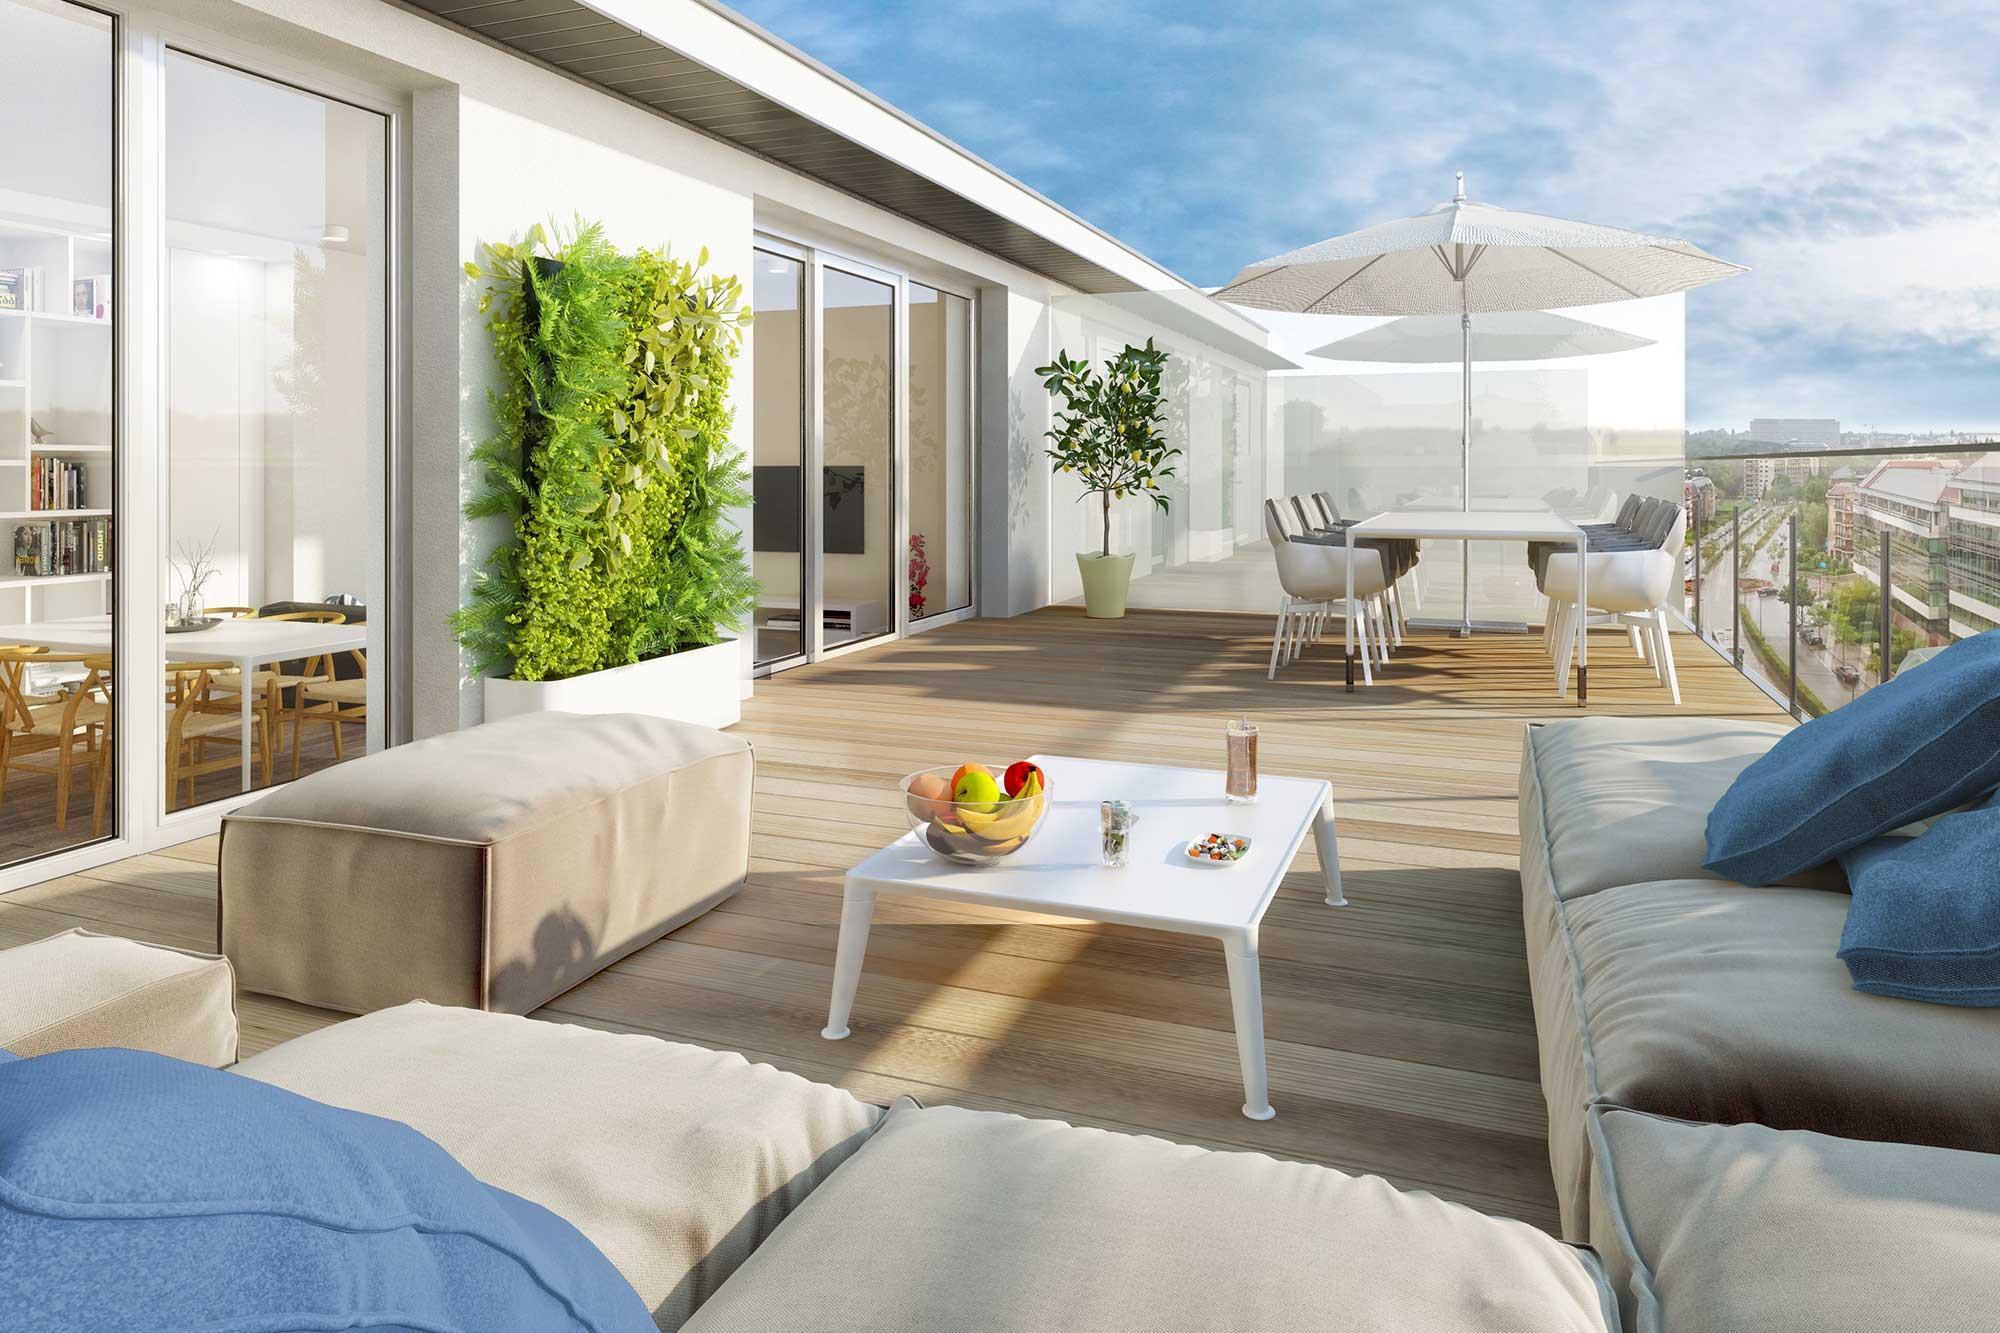 LesBalcons-Woluwe_detail-penthouse-terras